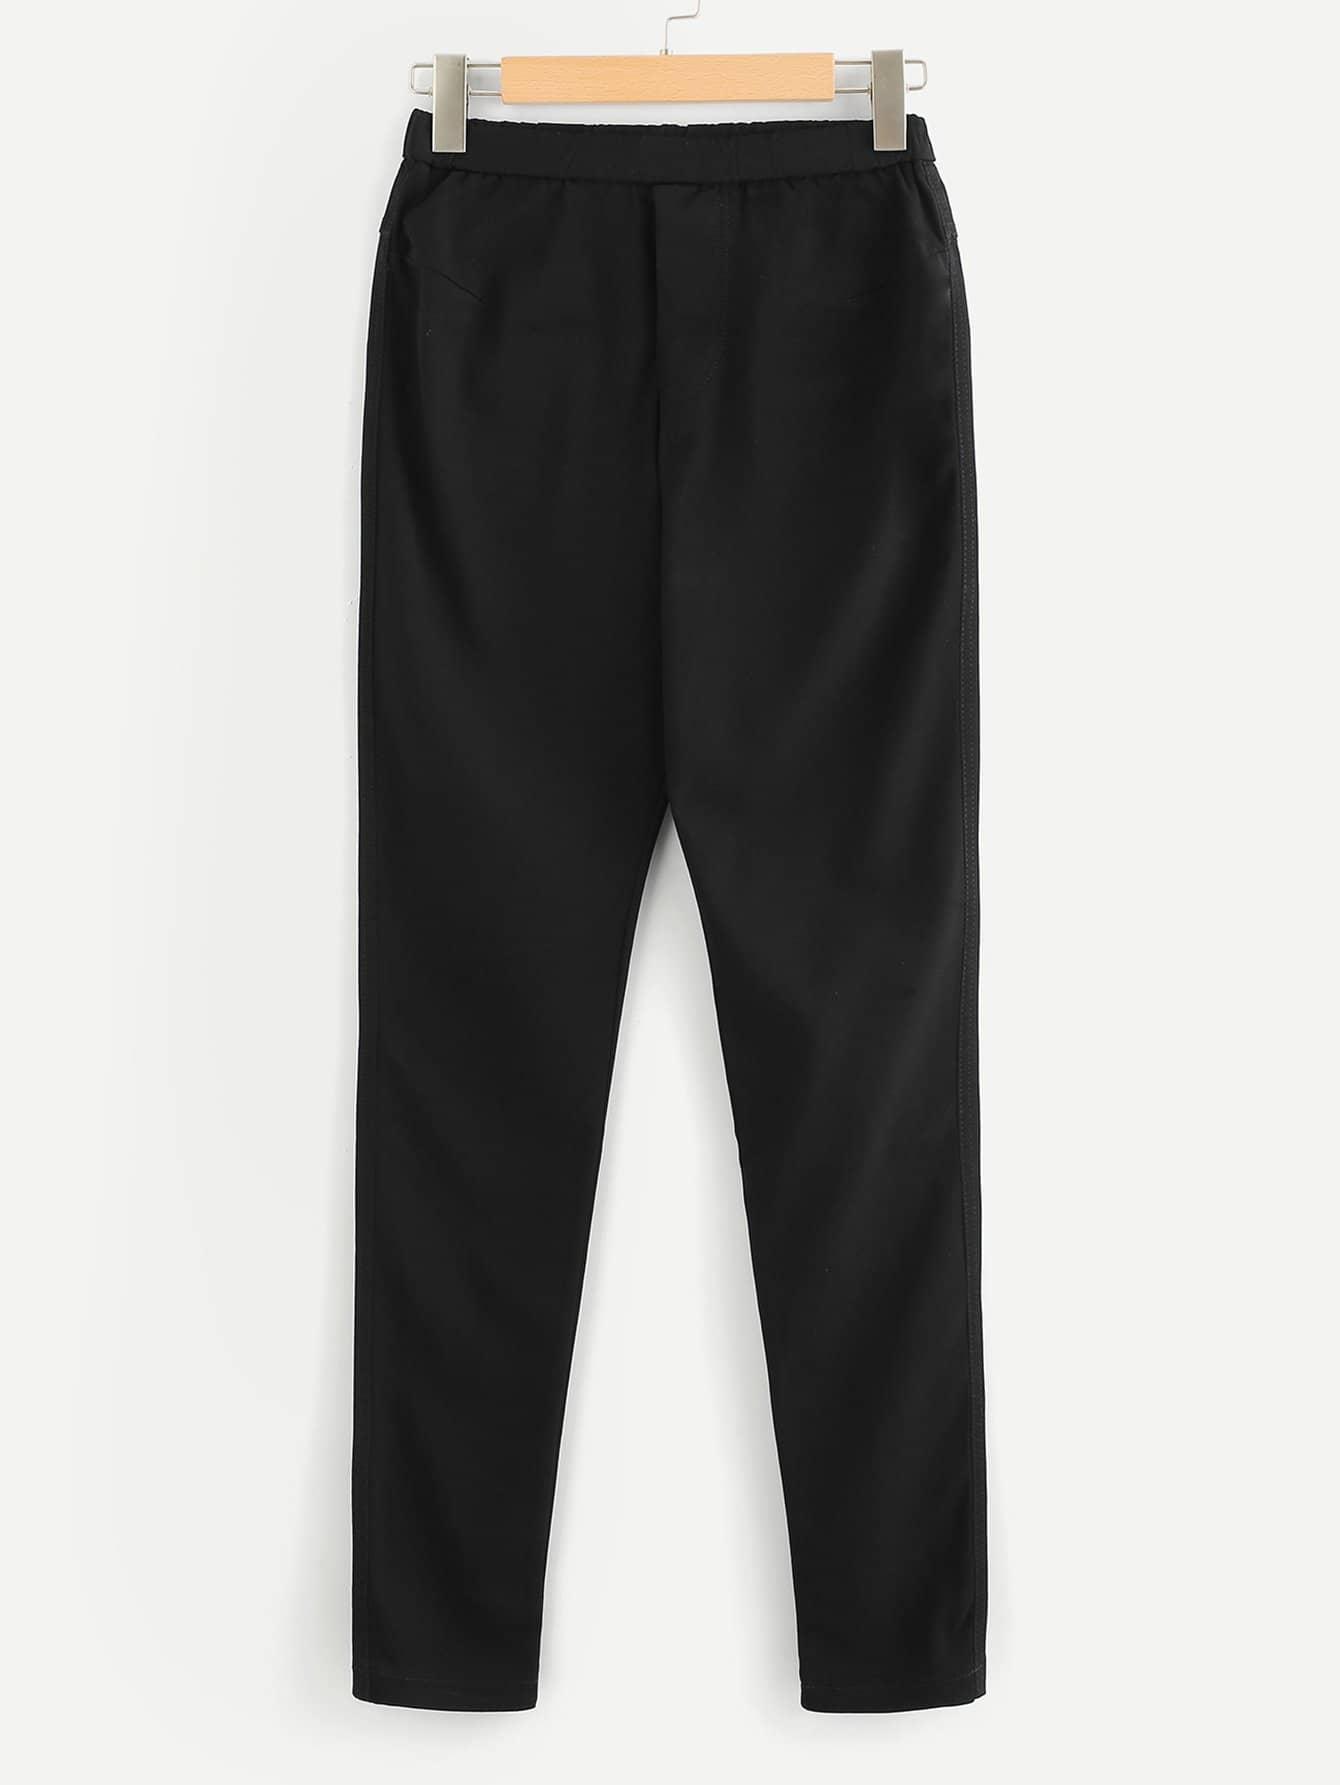 Elastic Waist Faux Fly Stretch Pants elastic waist faux fly stretch pants